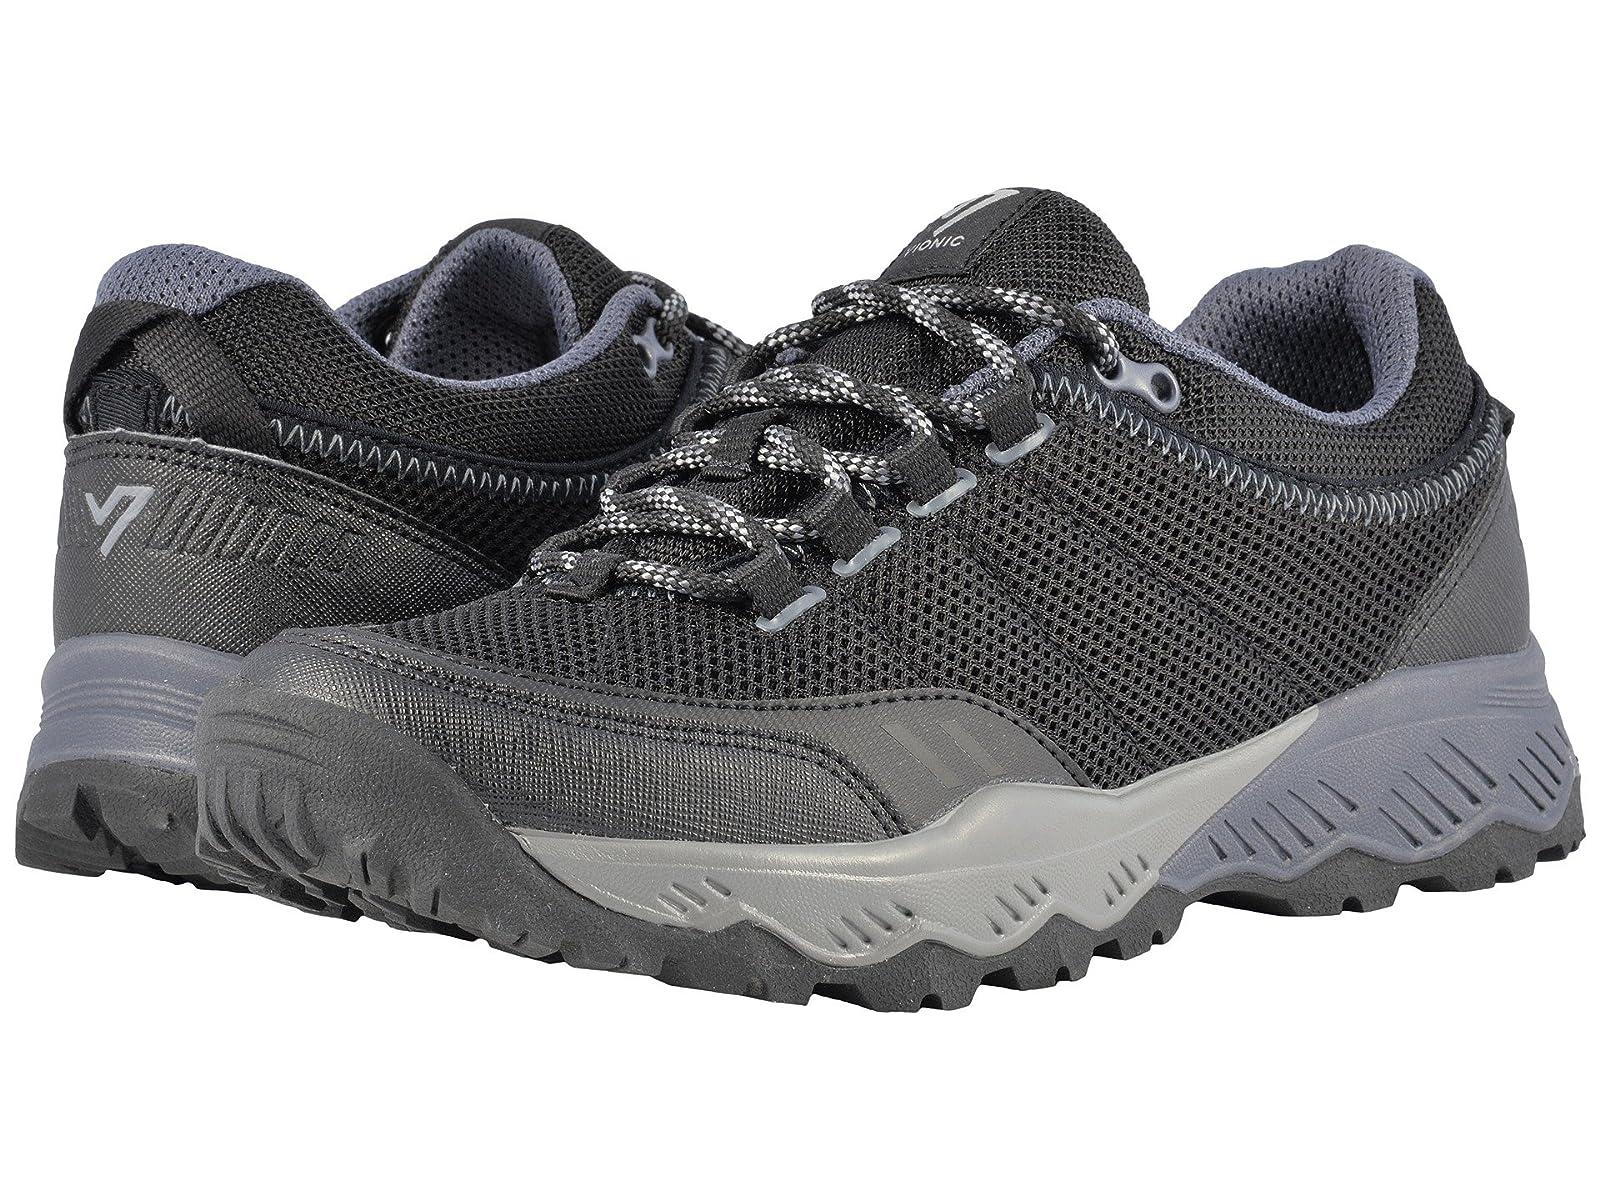 VIONIC McKinley Trail WalkerCheap and distinctive eye-catching shoes